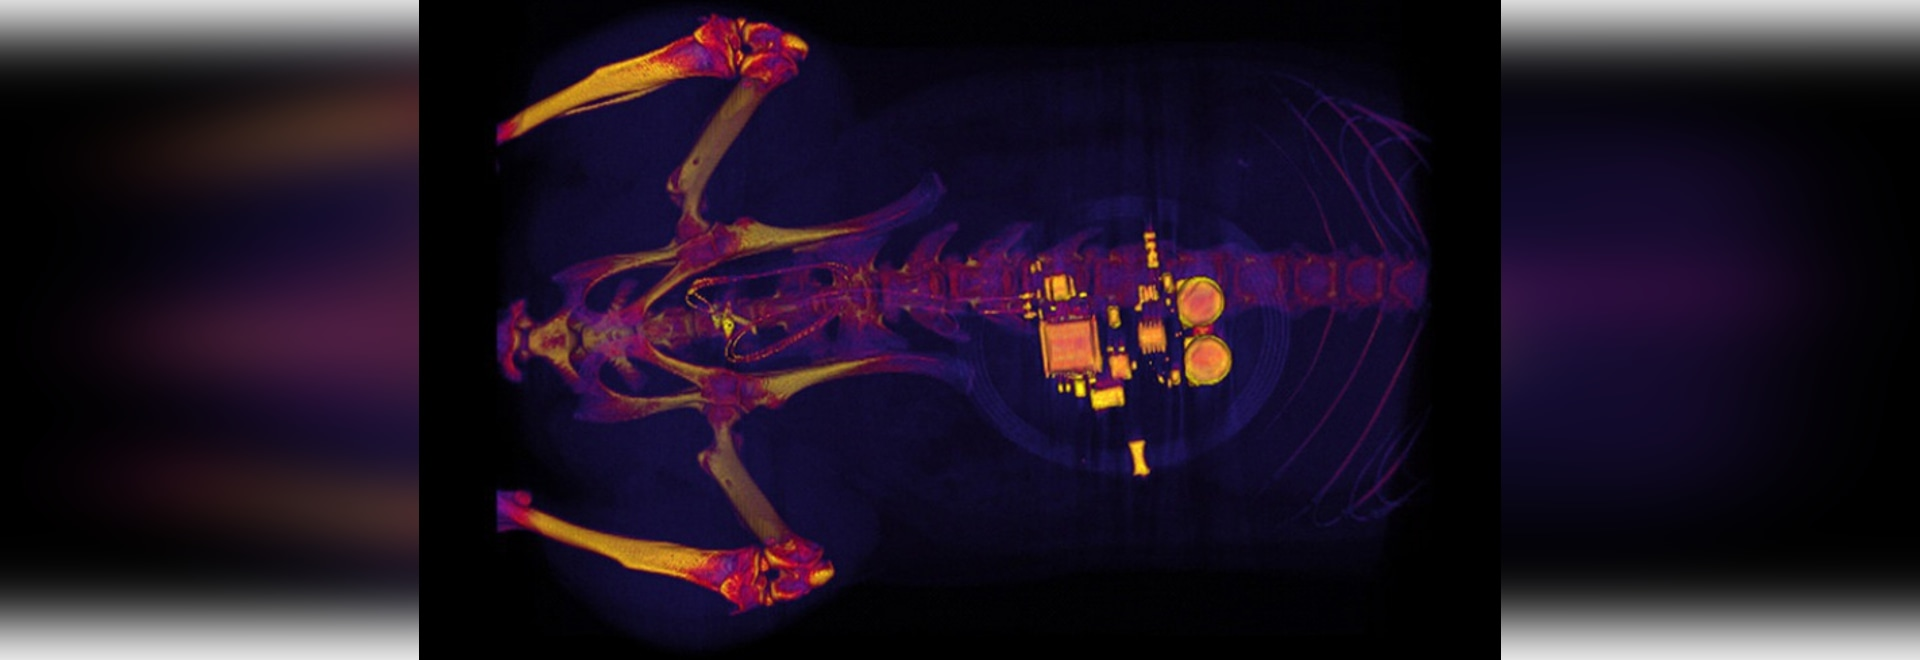 El implante controla la vejiga activa usando luces LED